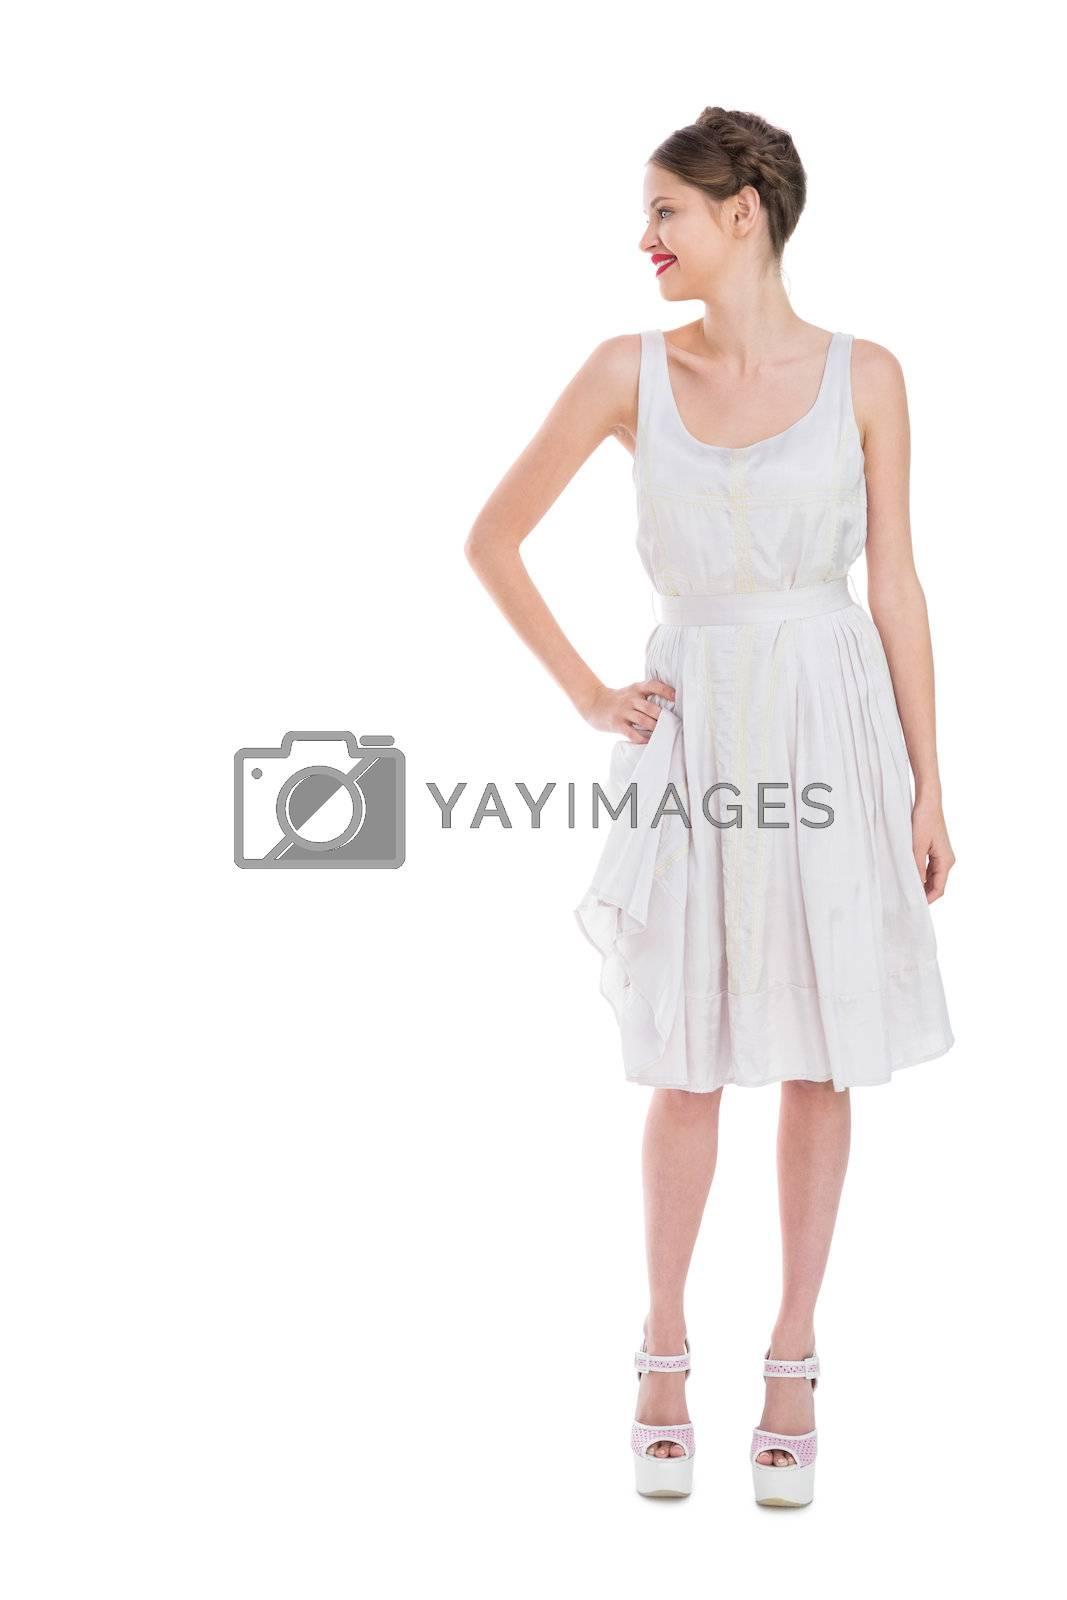 Cheerful pretty woman in white dress posing by Wavebreakmedia